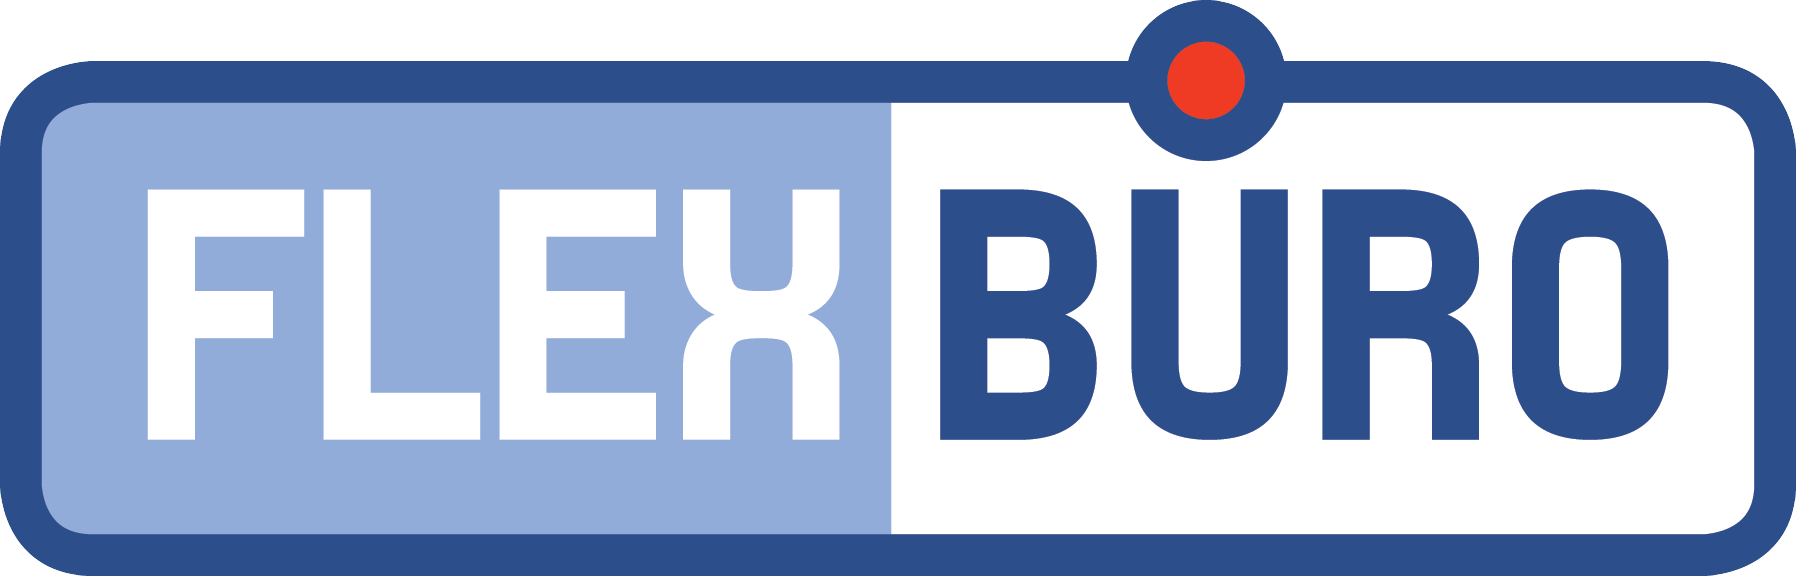 Flexbüro Hilfe & Support